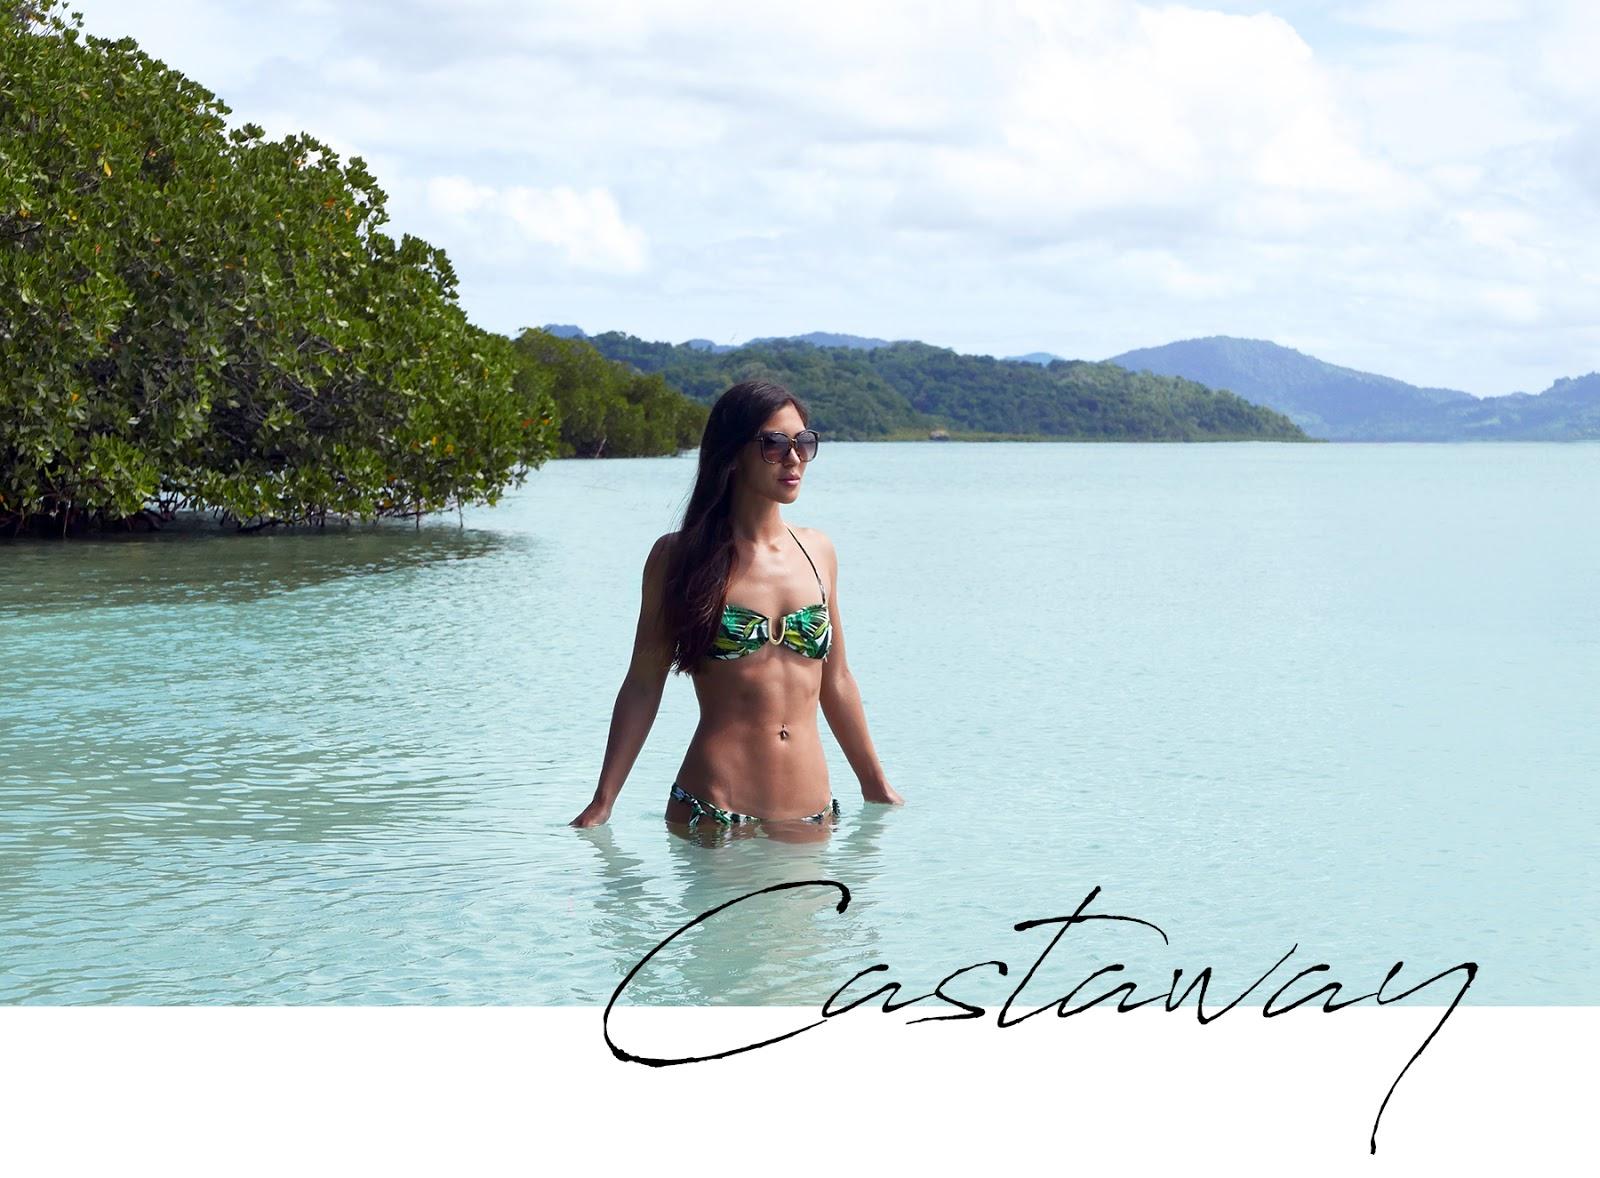 Euriental | luxury travel & style | Hunkemoller bikini, Tom Ford sunglasses, Fiji